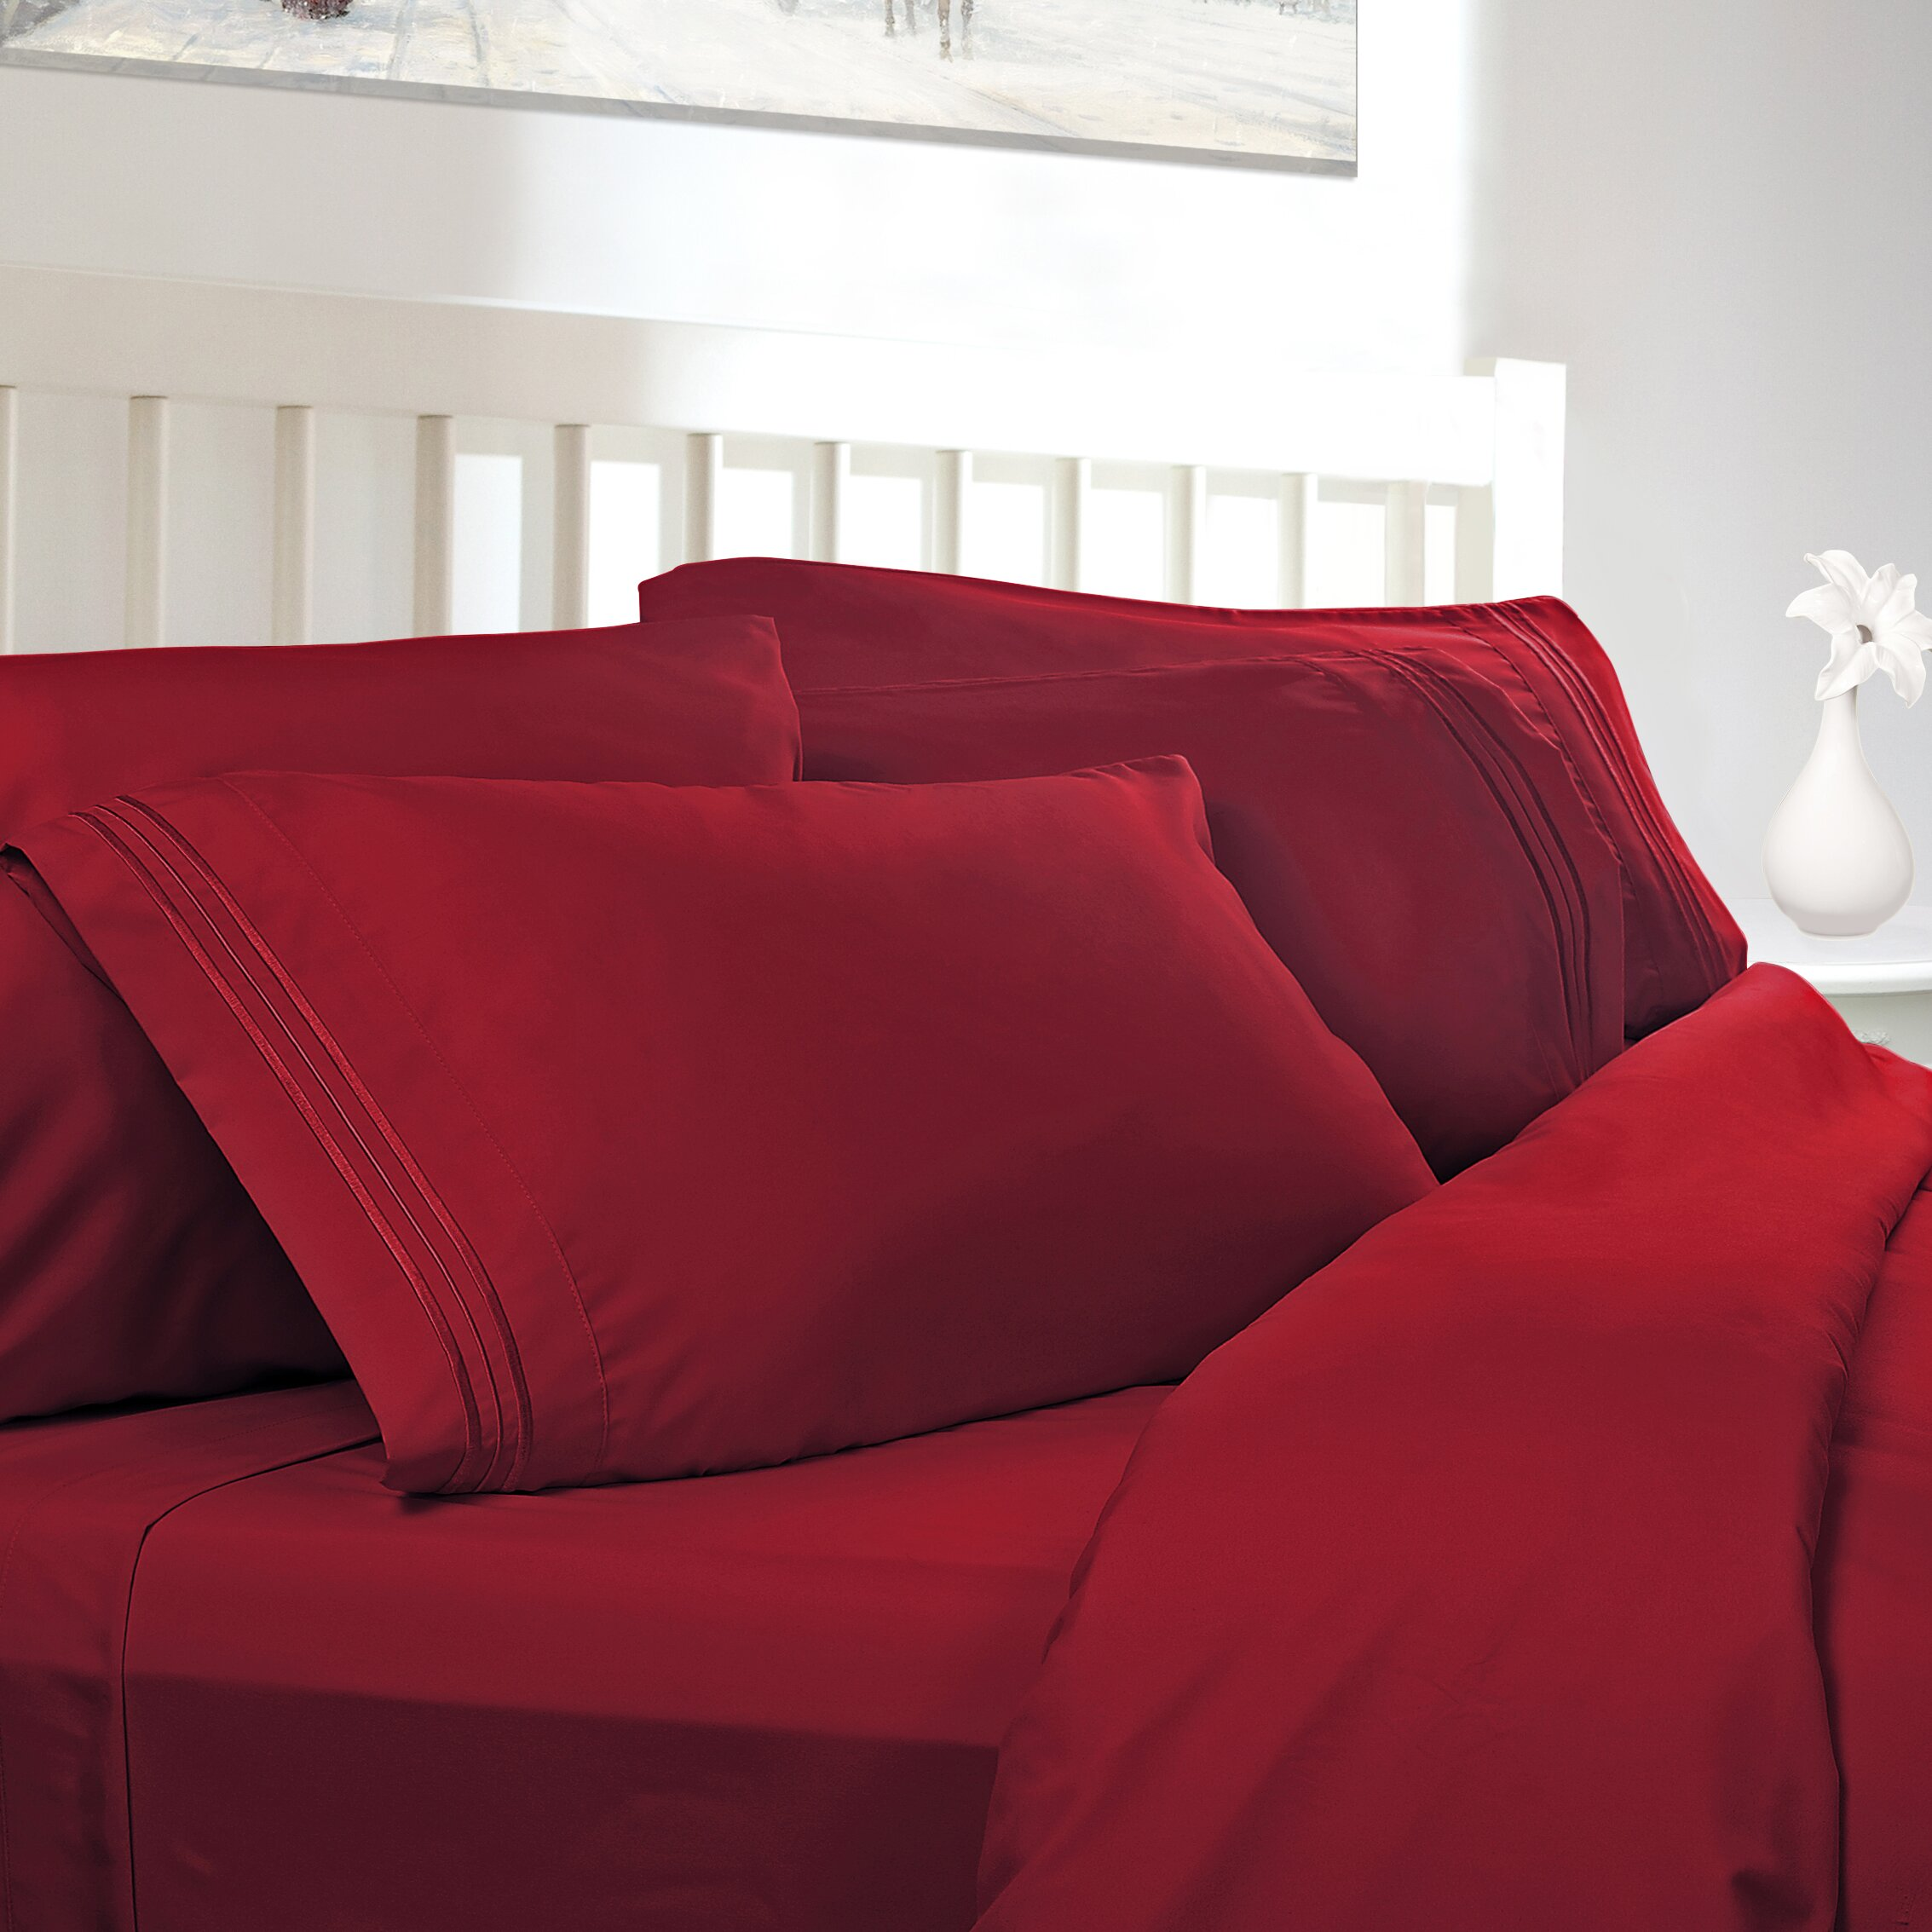 clara clark grand 1800 thread count sheet set reviews wayfair. Black Bedroom Furniture Sets. Home Design Ideas